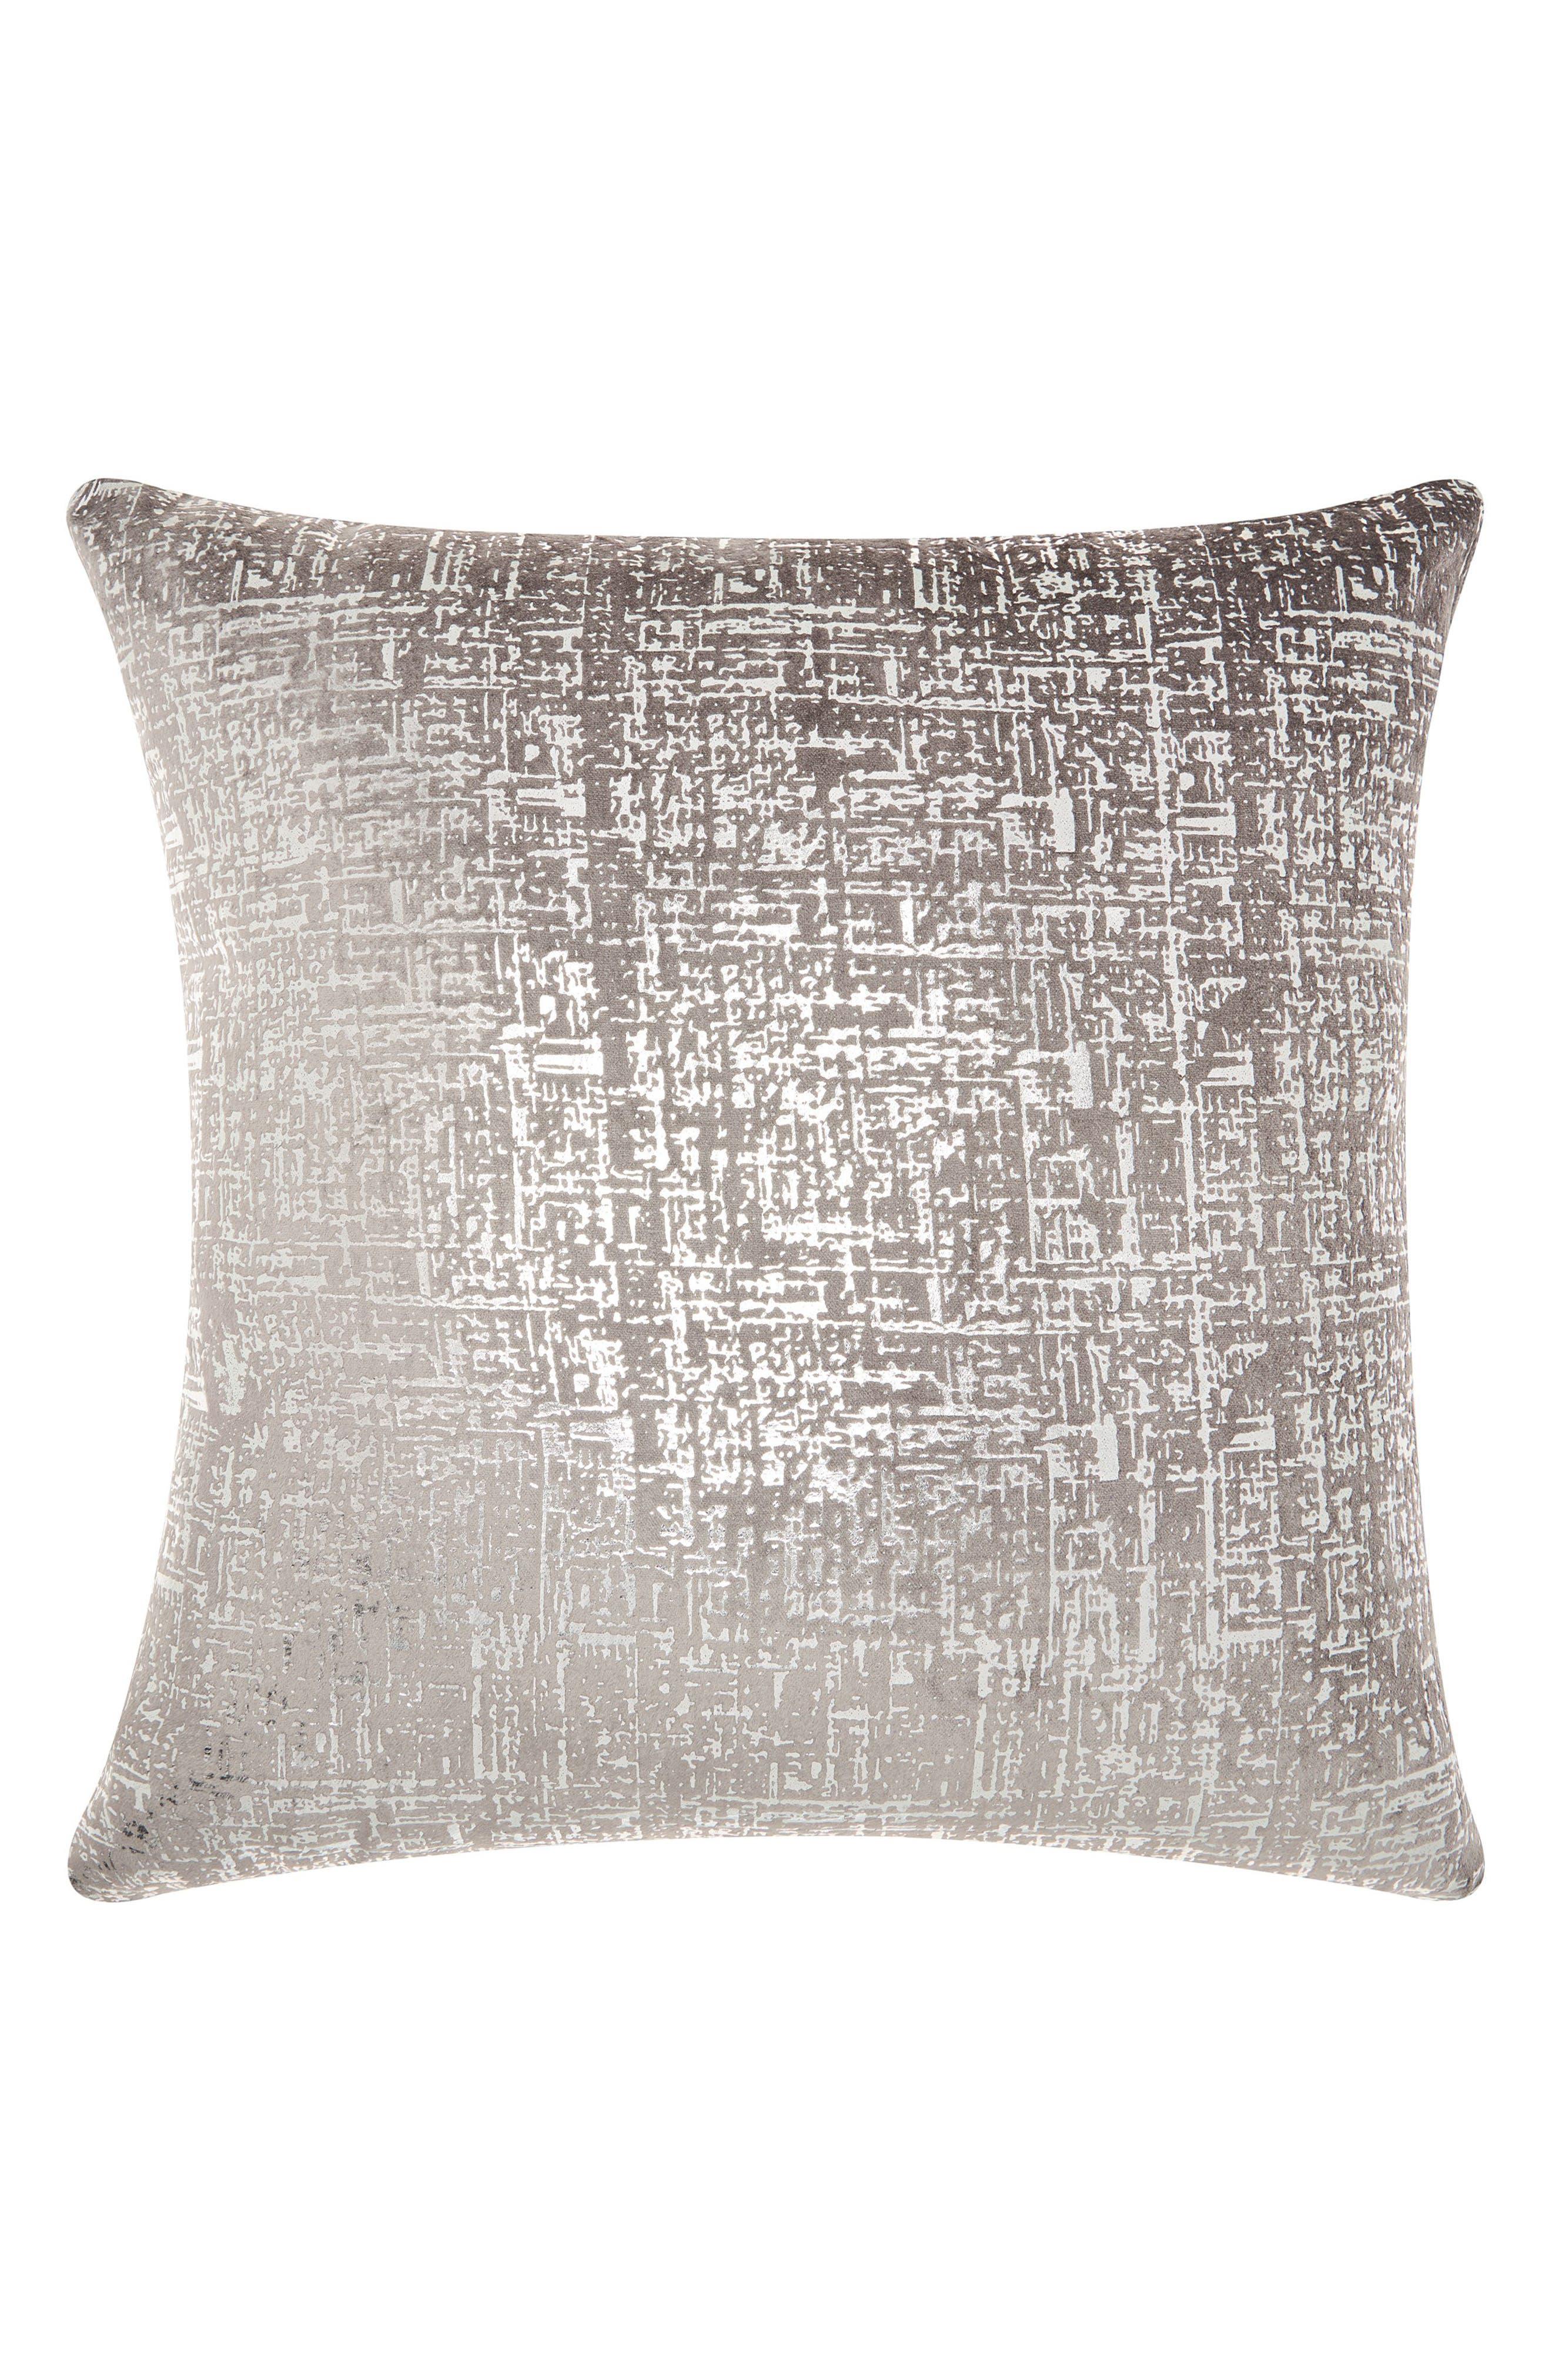 Distressed Velvet Accent Pillow,                         Main,                         color, 030